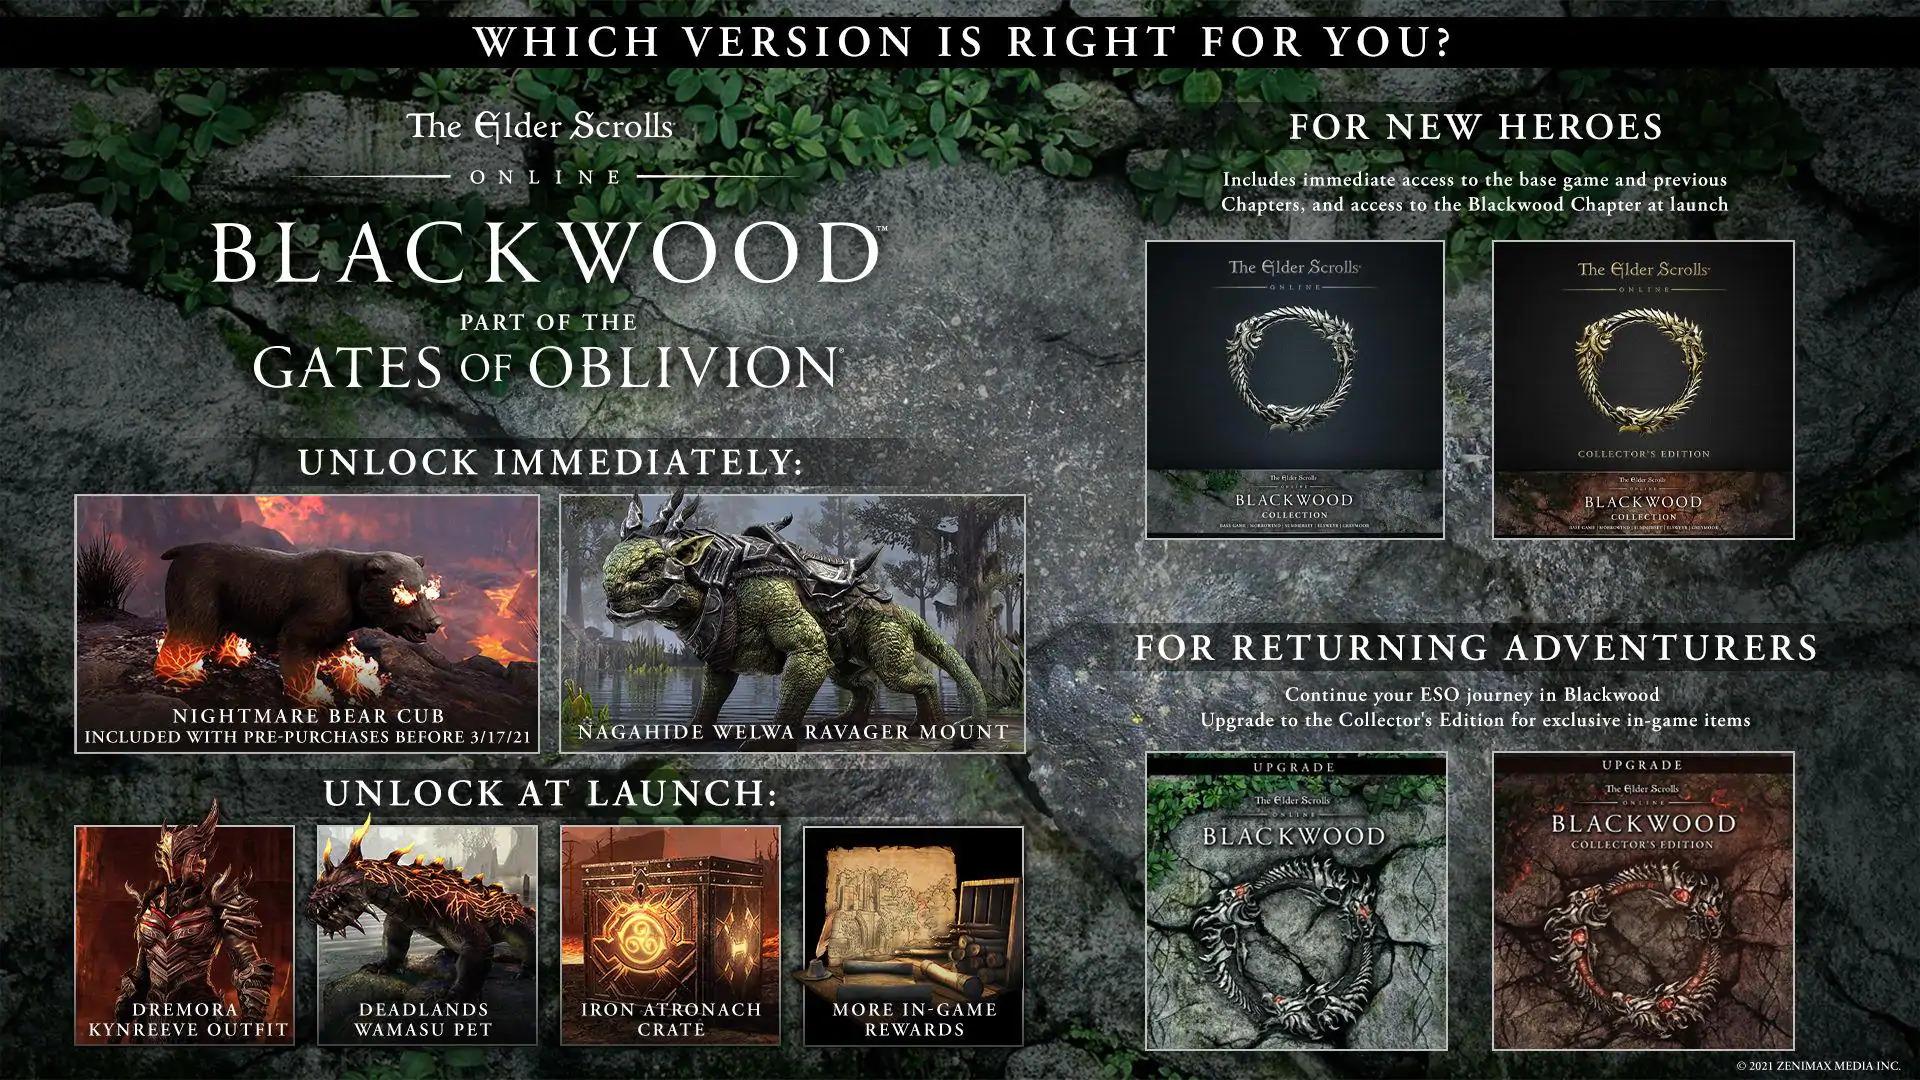 Blíže představeno The Elder Scrolls Online: Gates of Oblivion f57554793bb89a08d1b22227e2386baa